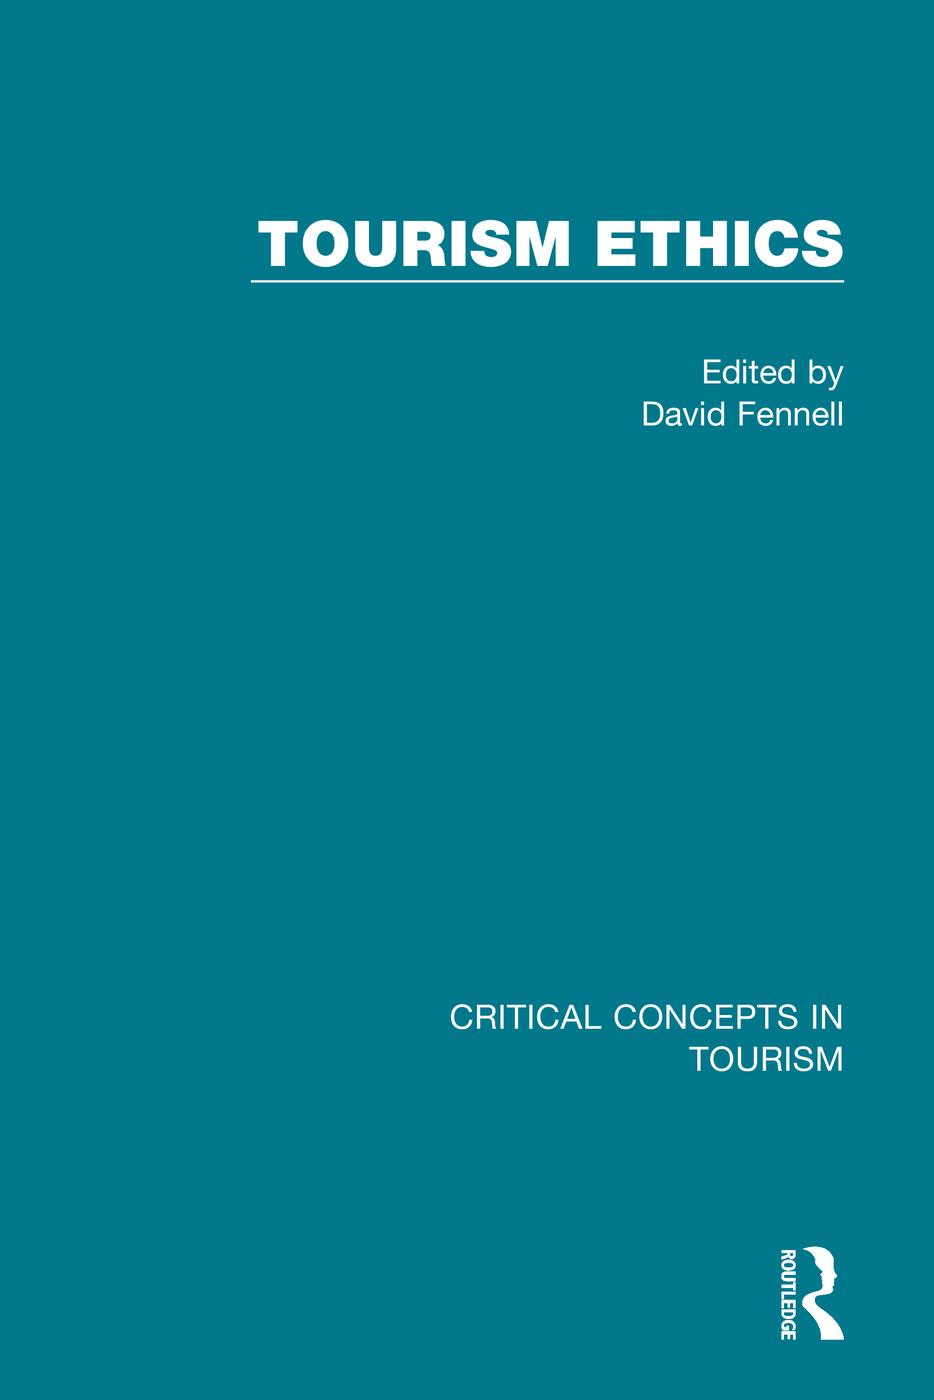 Tourism Ethics book cover